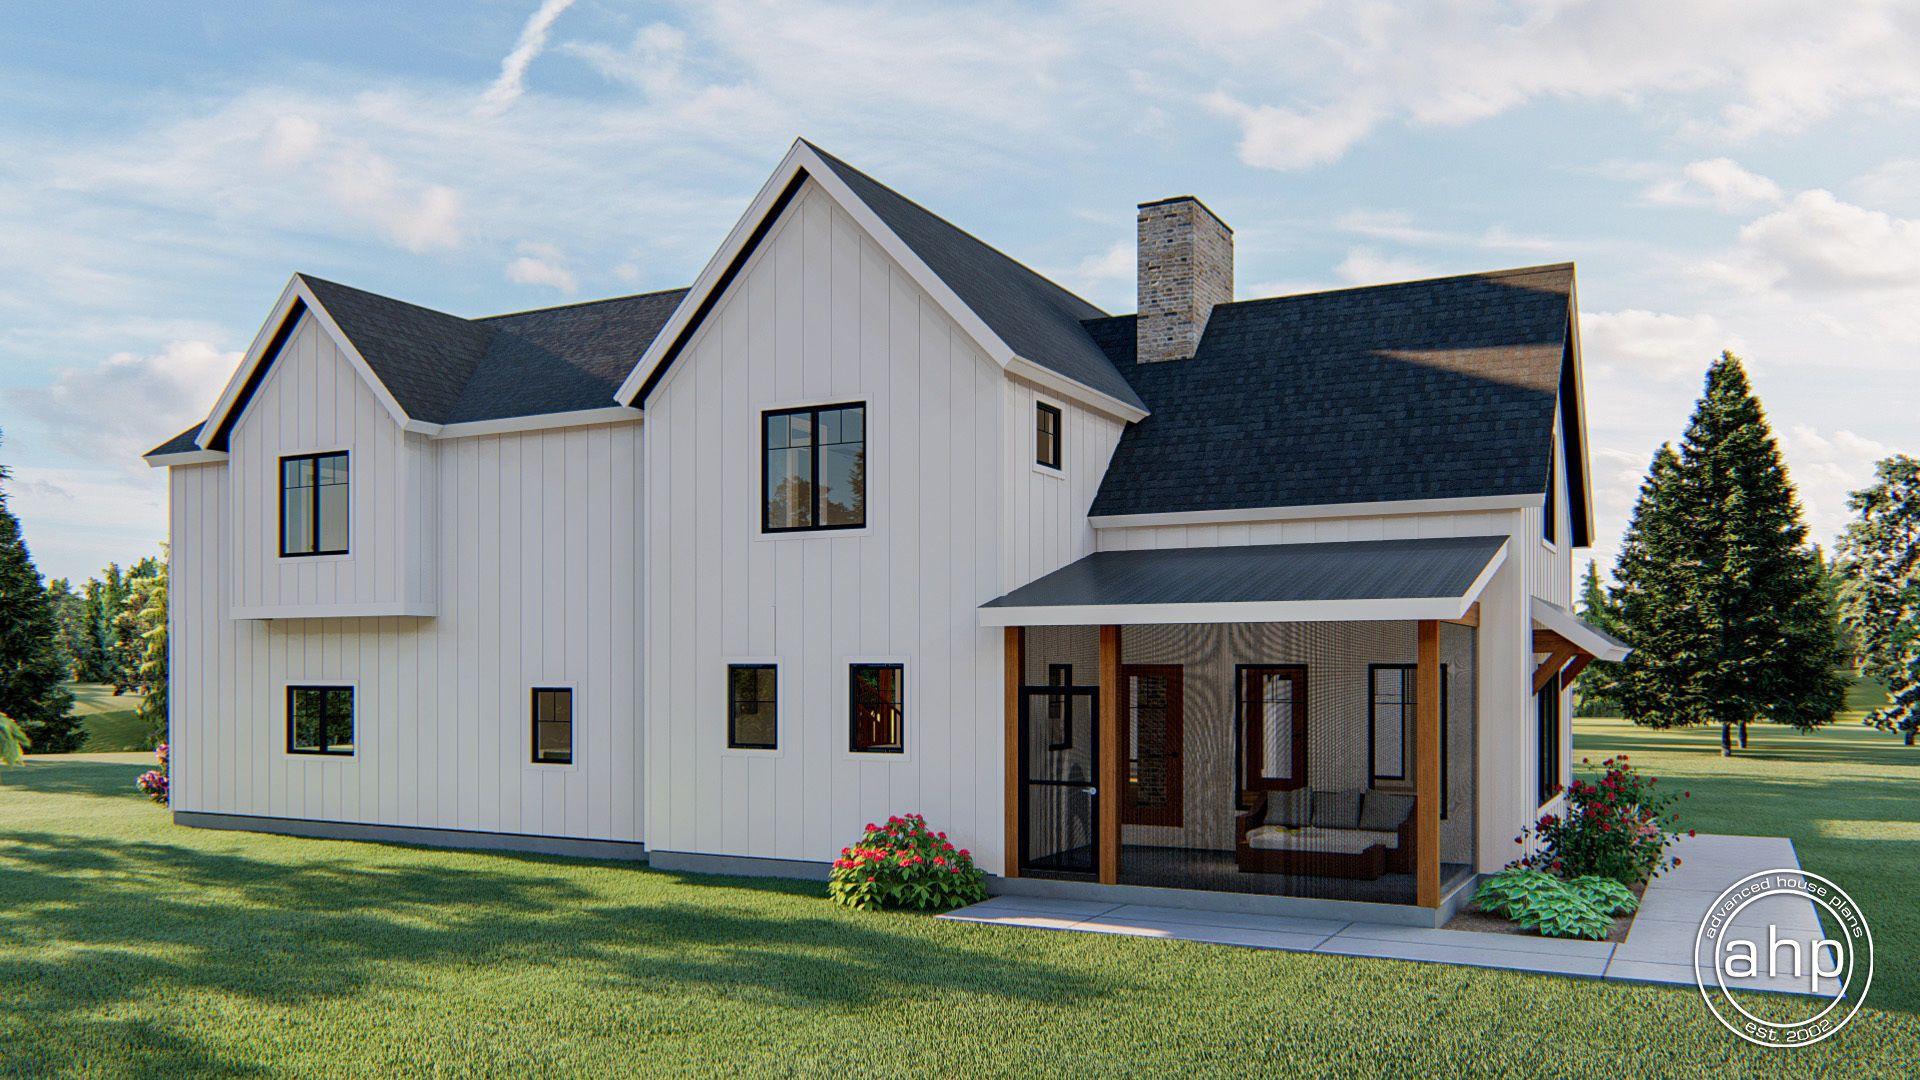 2 Story Modern Farmhouse Style House Plan Waco Flats Farmhouse Style House Plans Modern Farmhouse Plans Farmhouse Style House